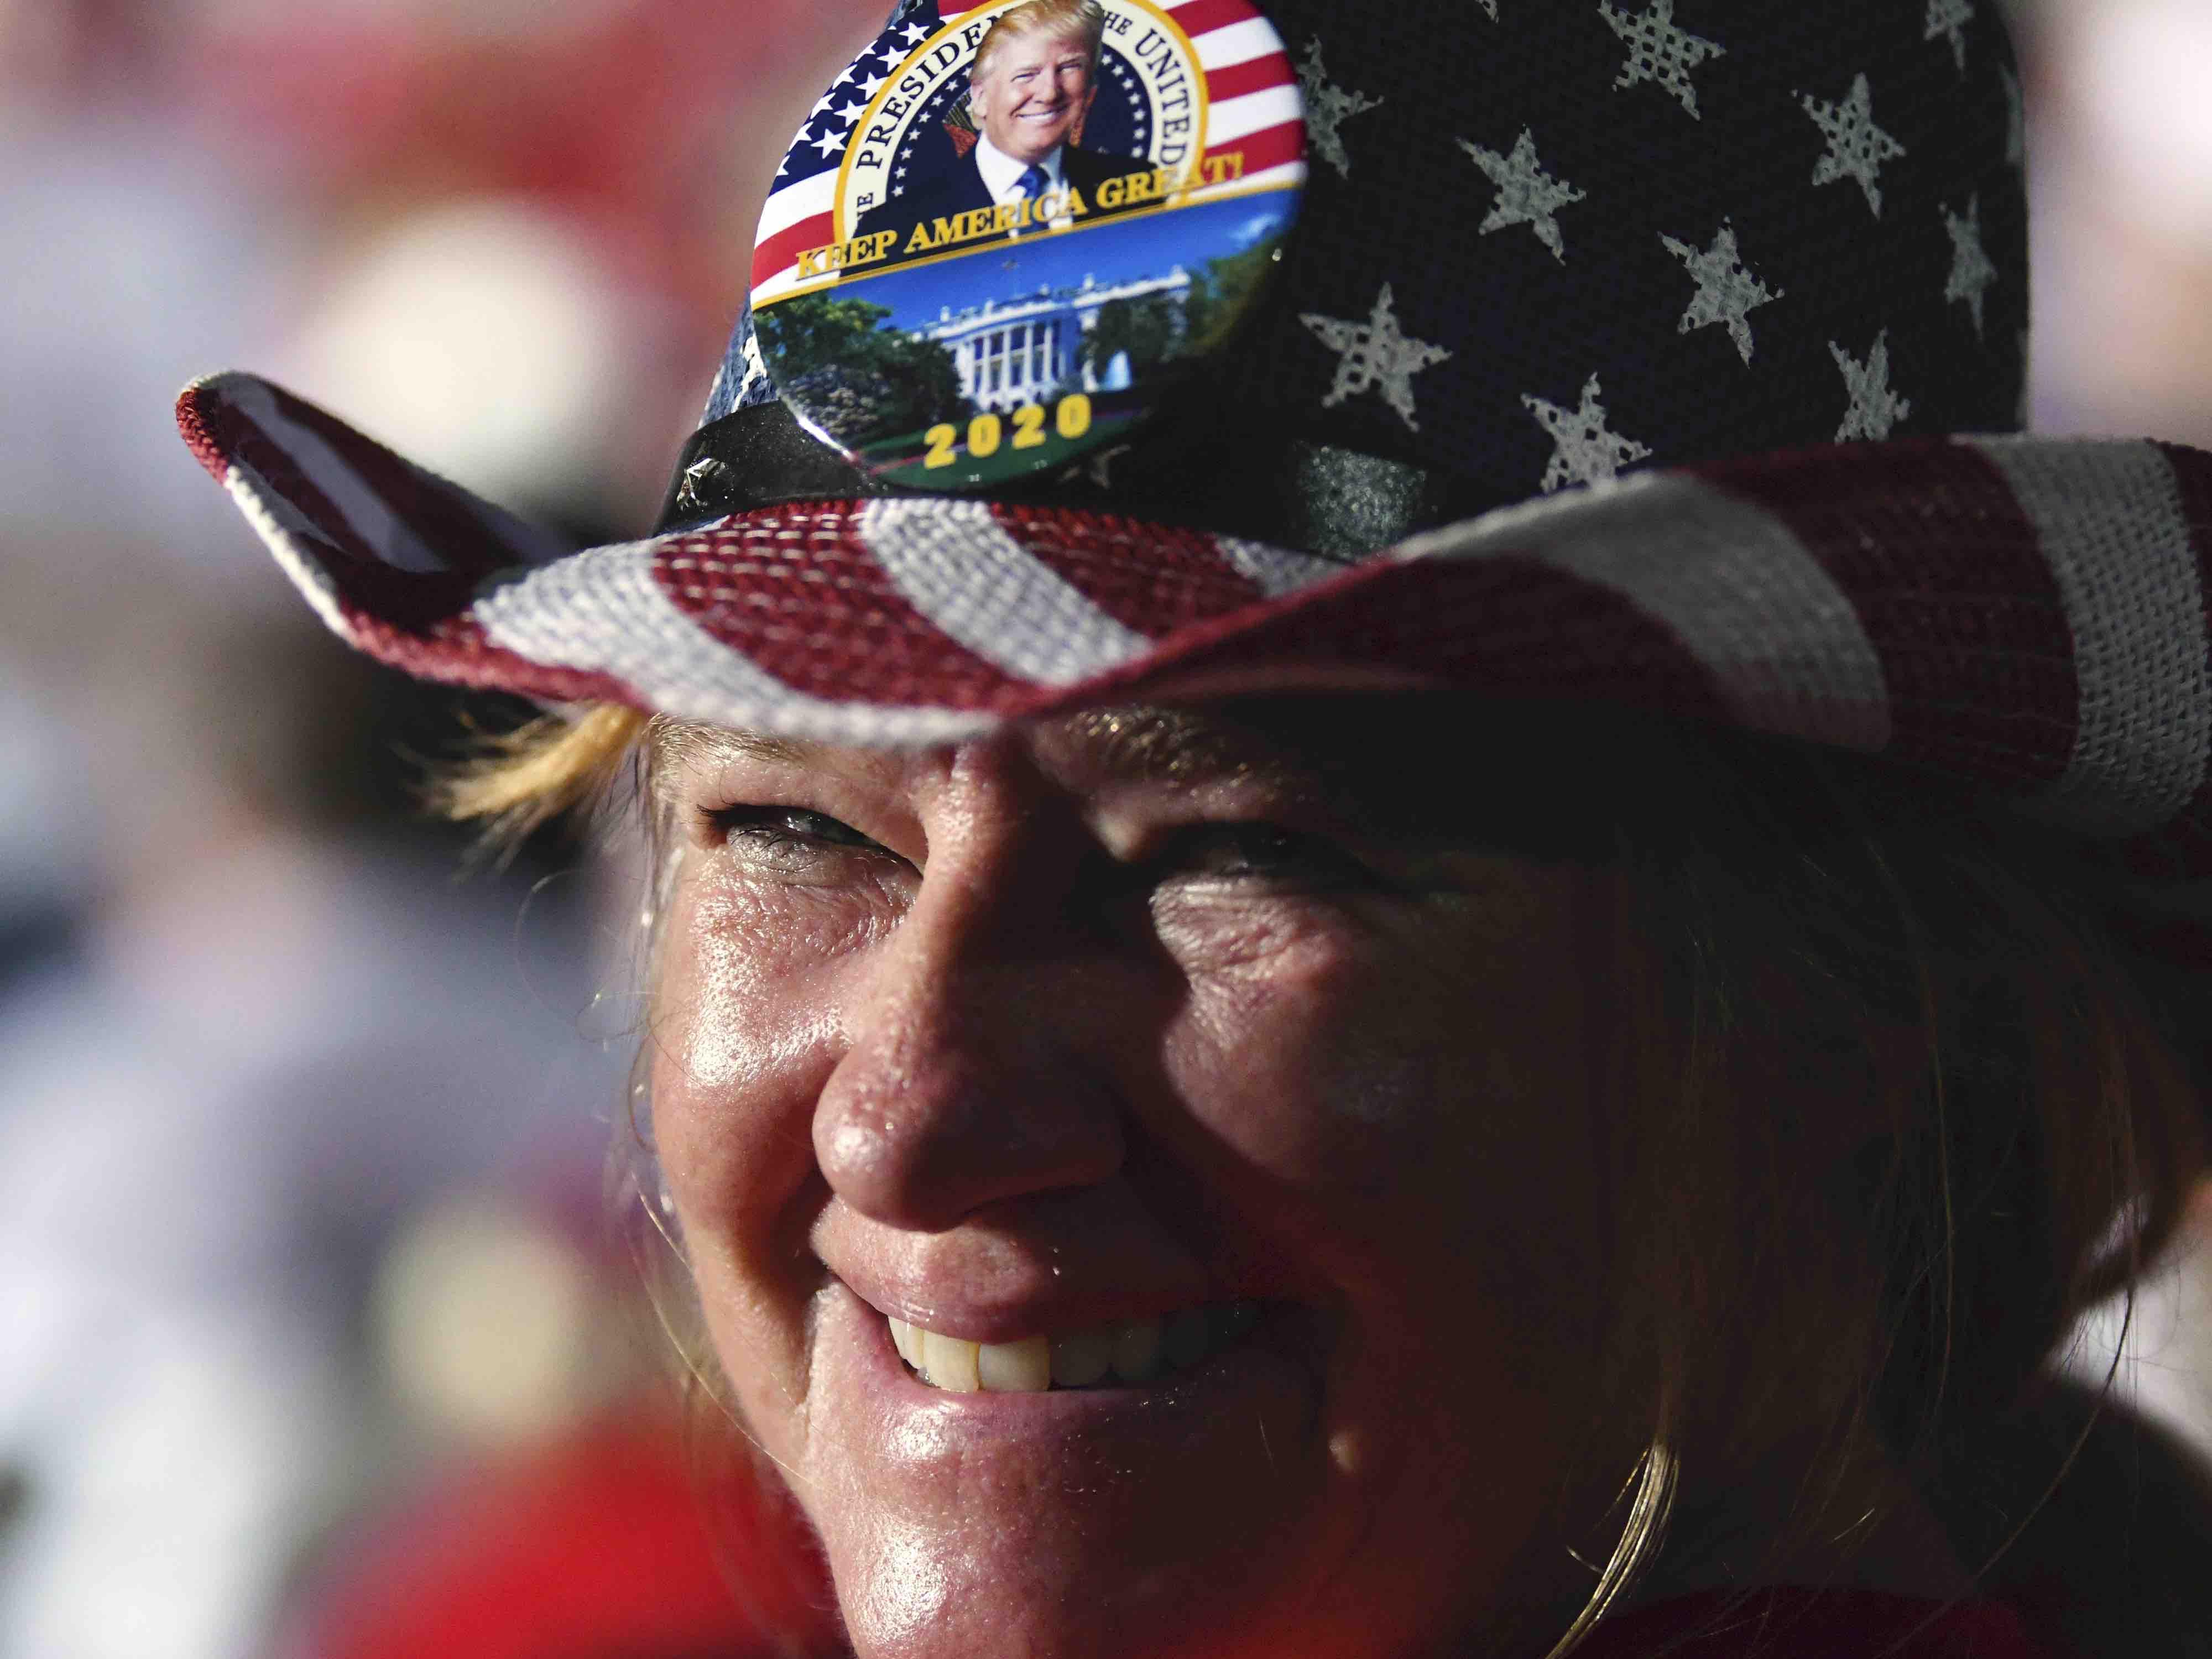 Trump supporter Miami (Jim Rassol / Associated Press)